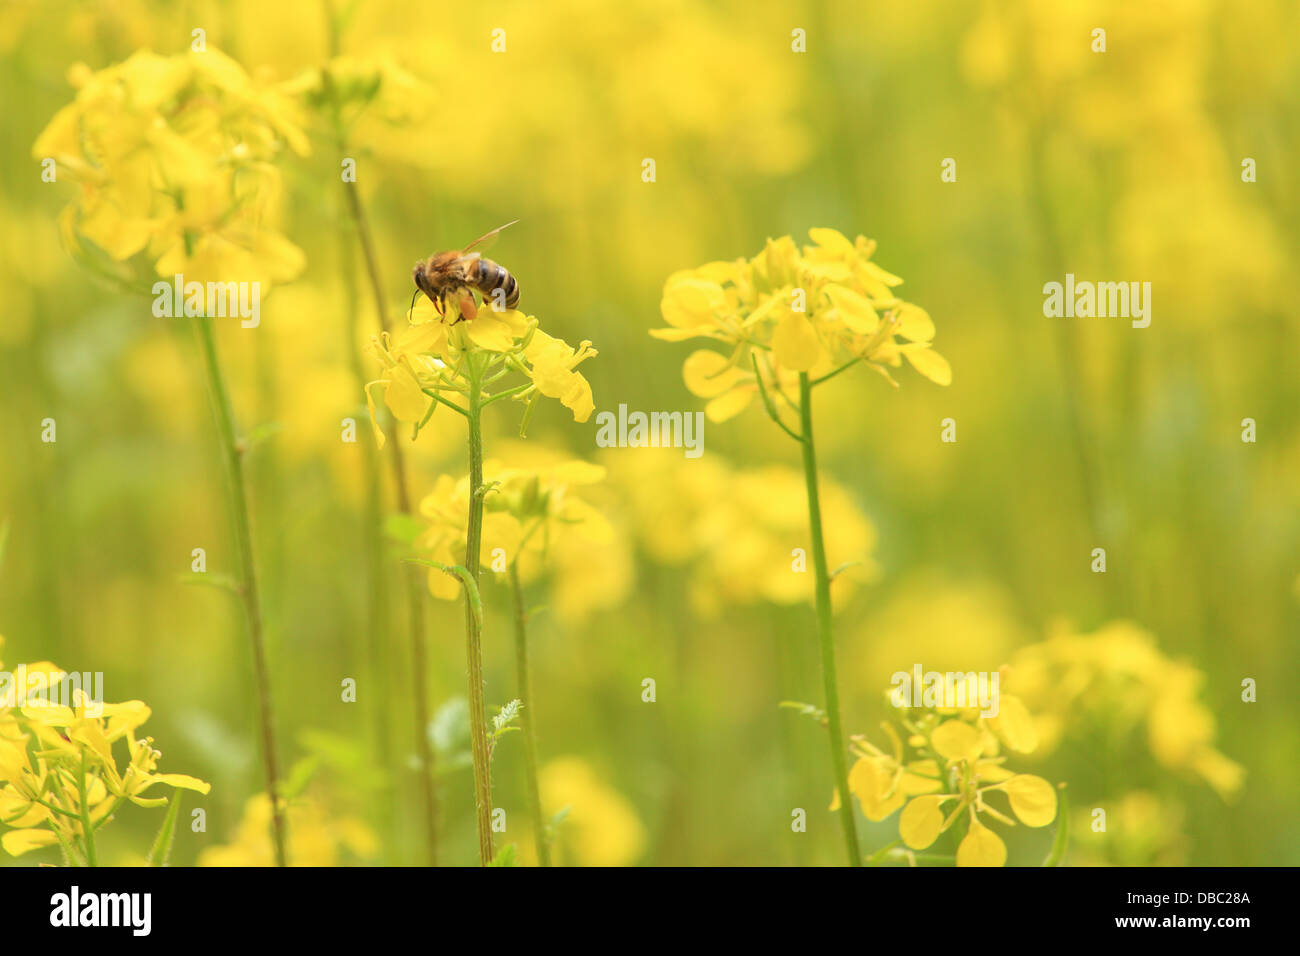 The European honey bee (Apis mellifera) collecting nectar on the flowers of White mustard plants(Sinapis alba). - Stock Image